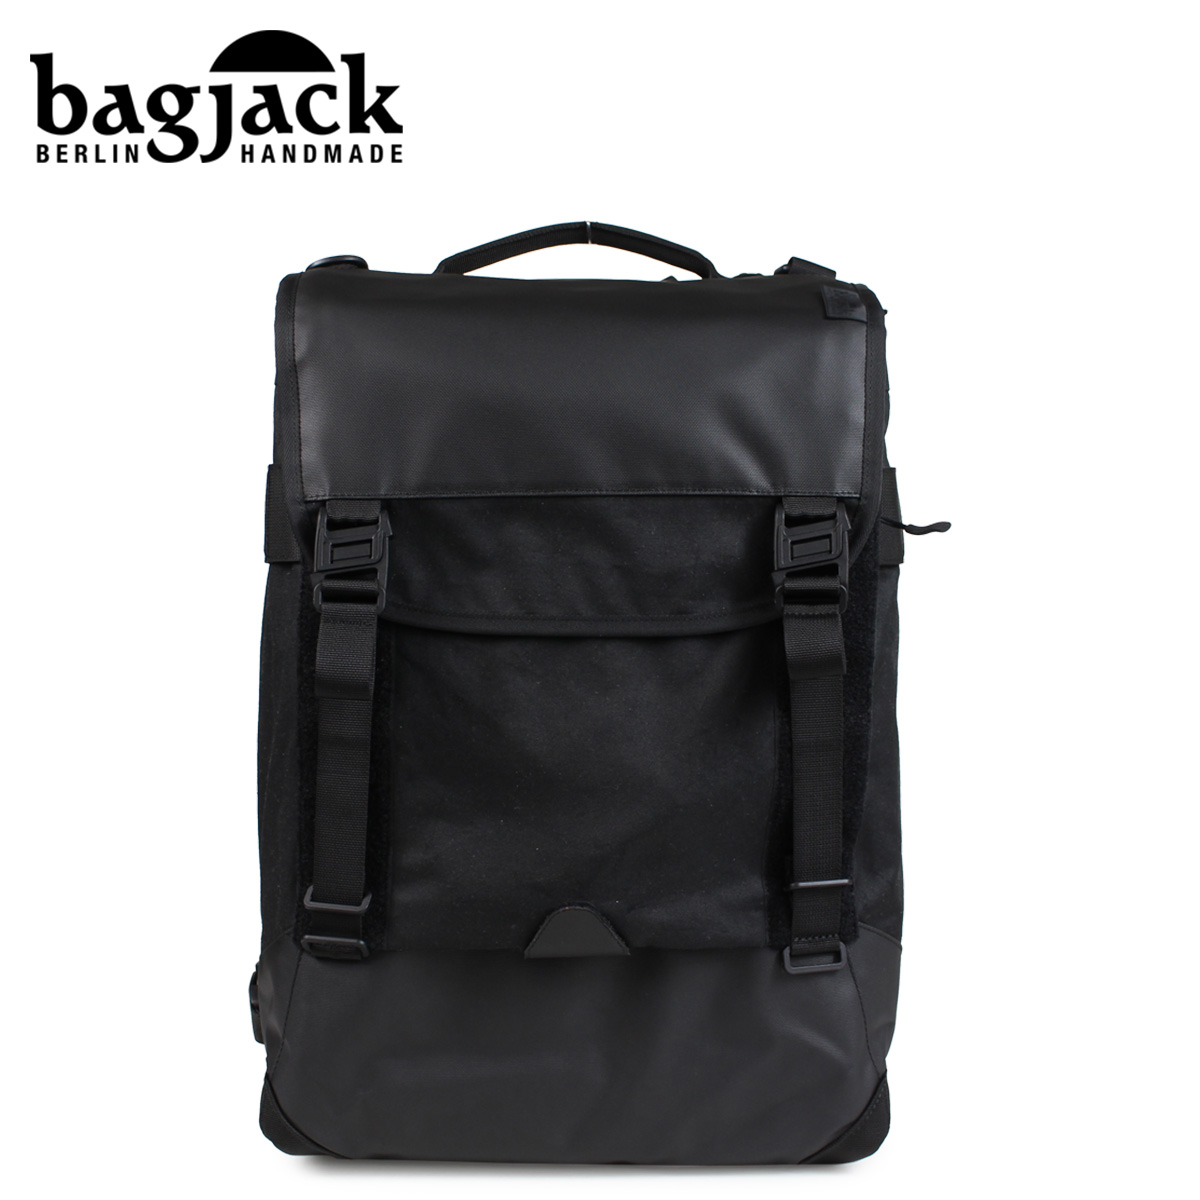 bagjack NEXT LEVEL NATURE TEC SKIDCAT バッグジャック リュック バックパック メンズ レディース ブラック